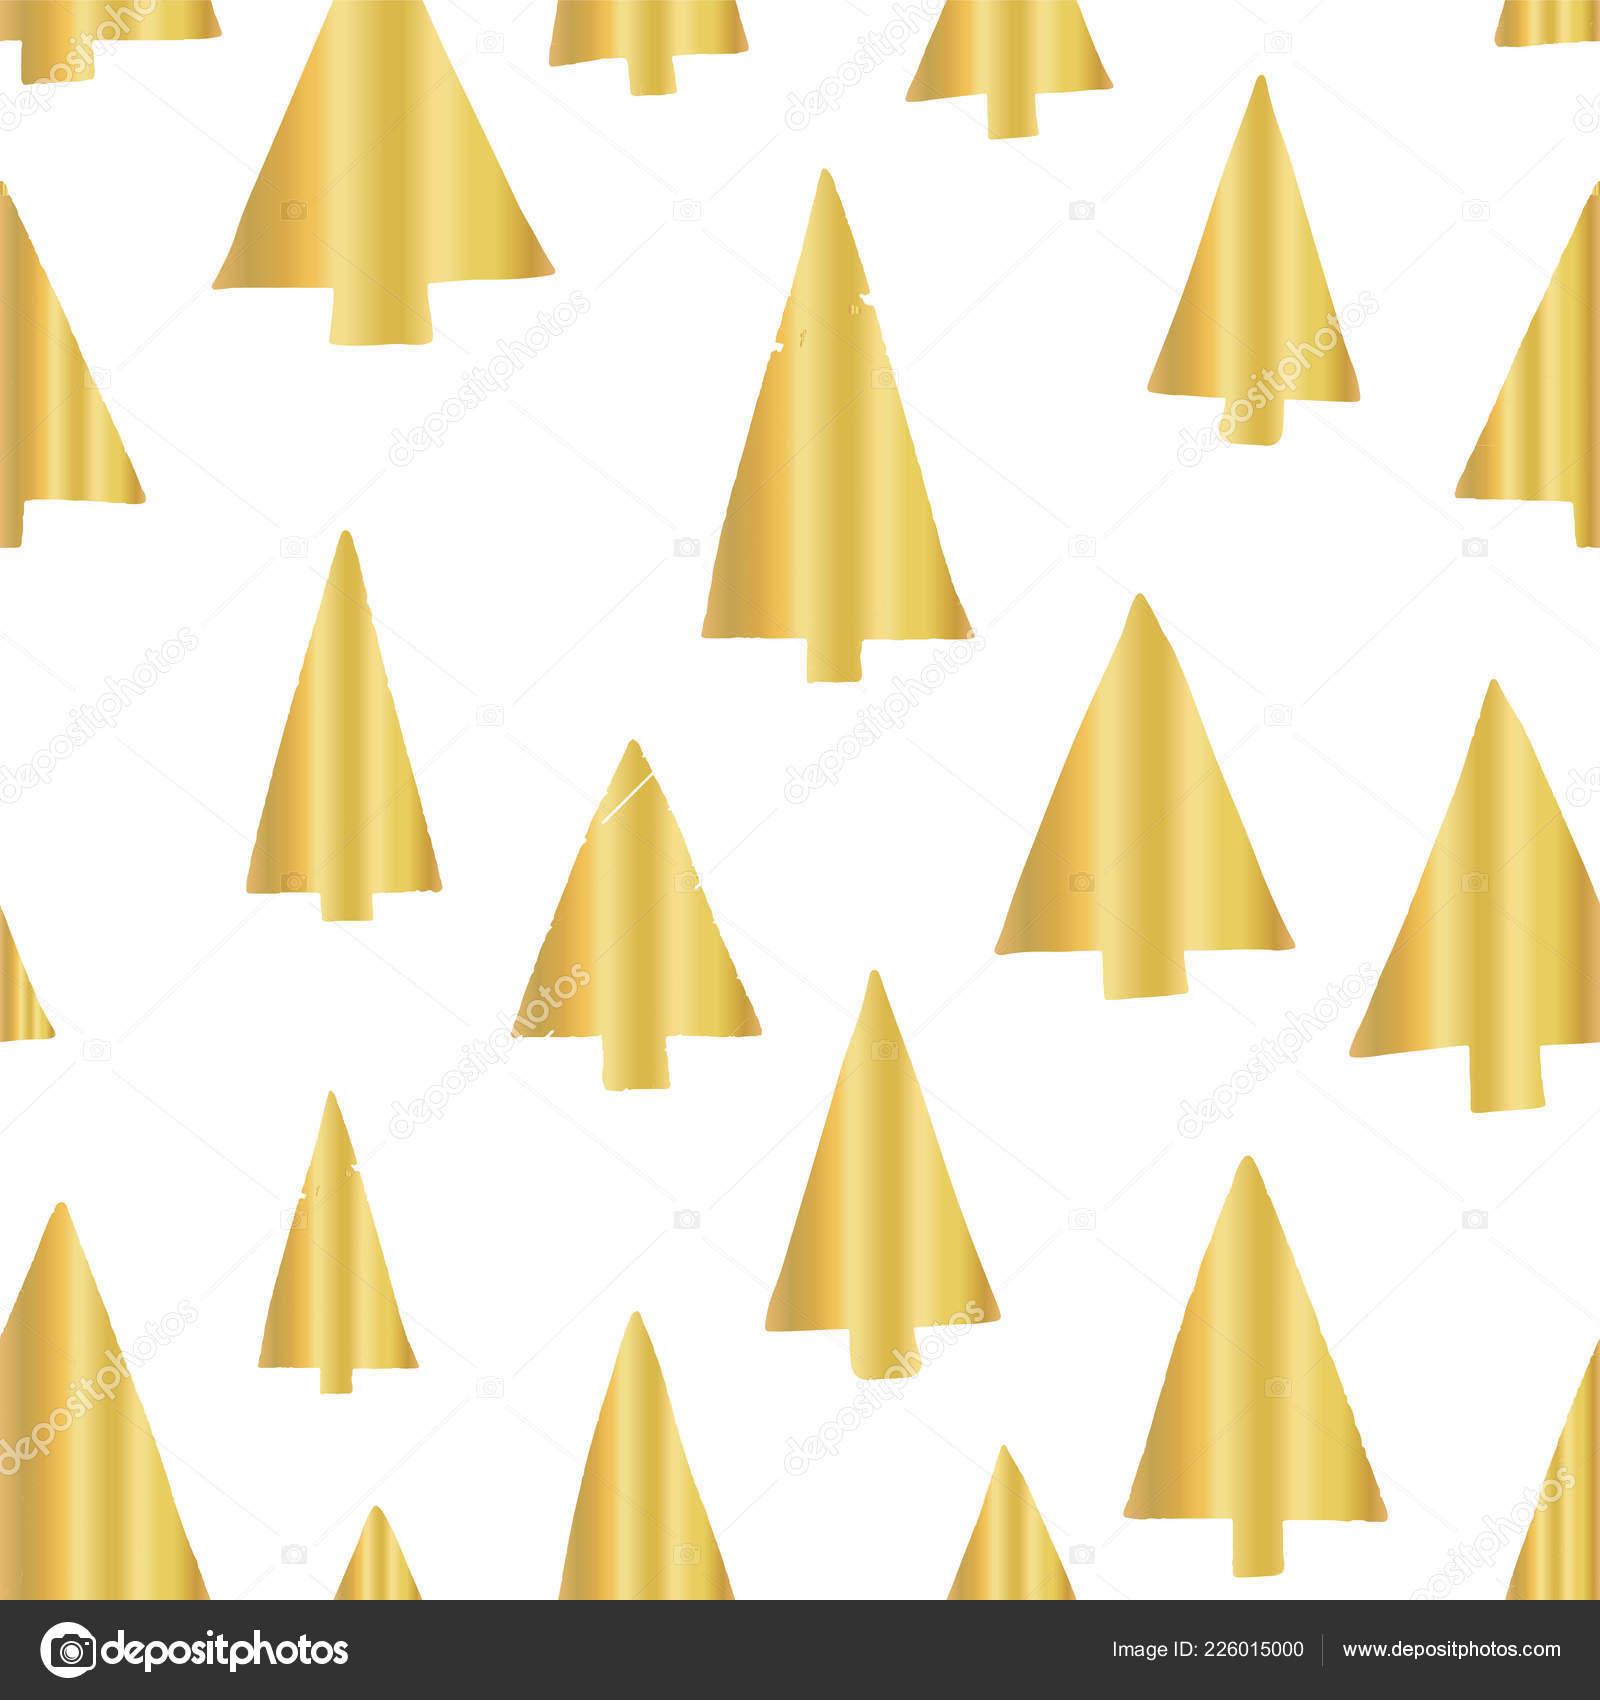 Gold Foil Christmas Tree Seamless Vector Pattern Backdrop Shiny